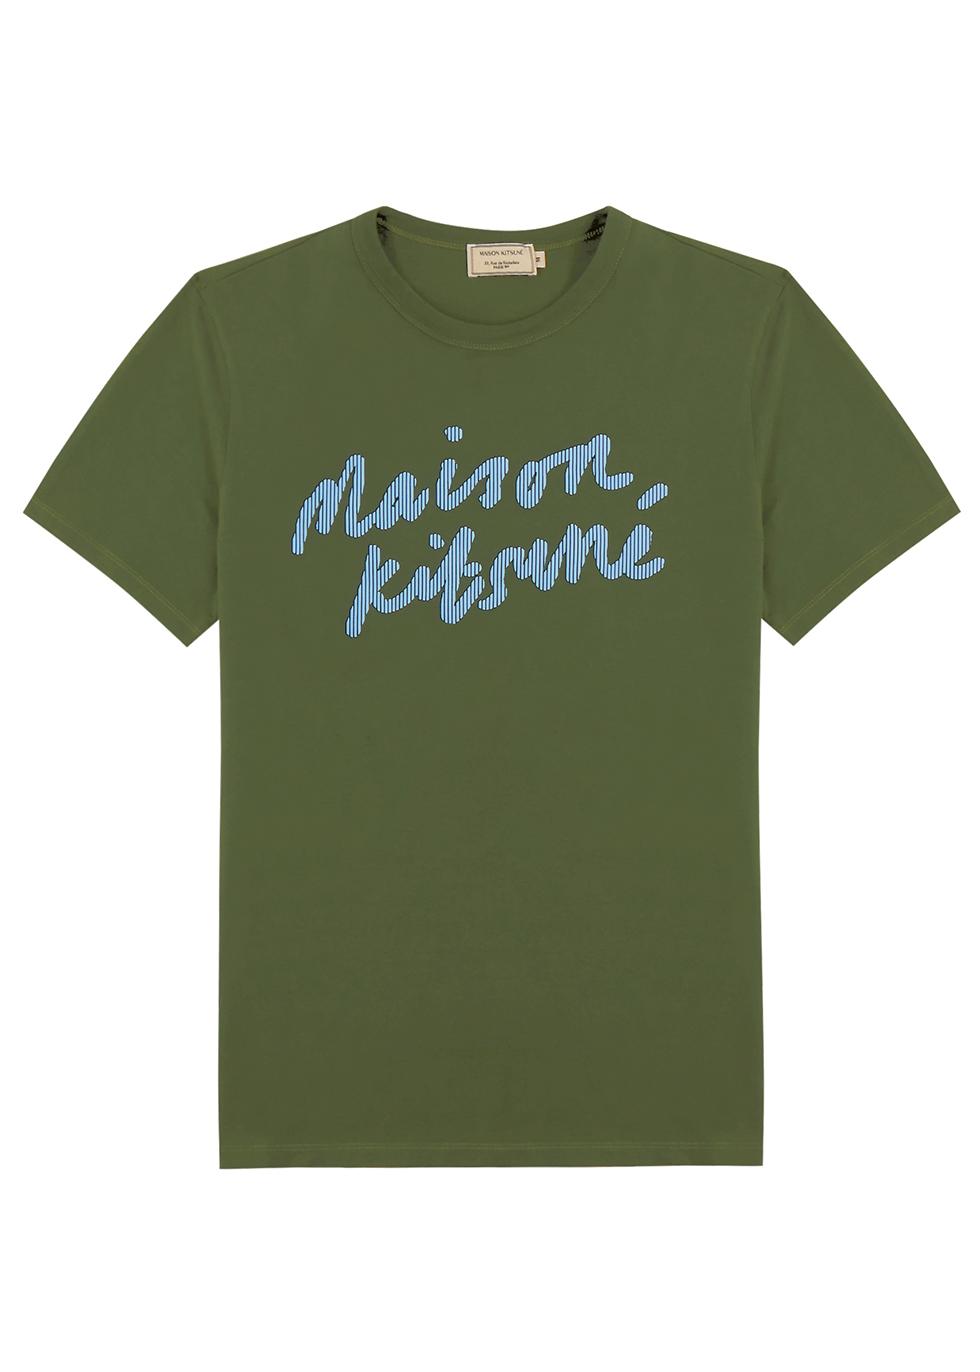 Army green printed cotton T-shirt